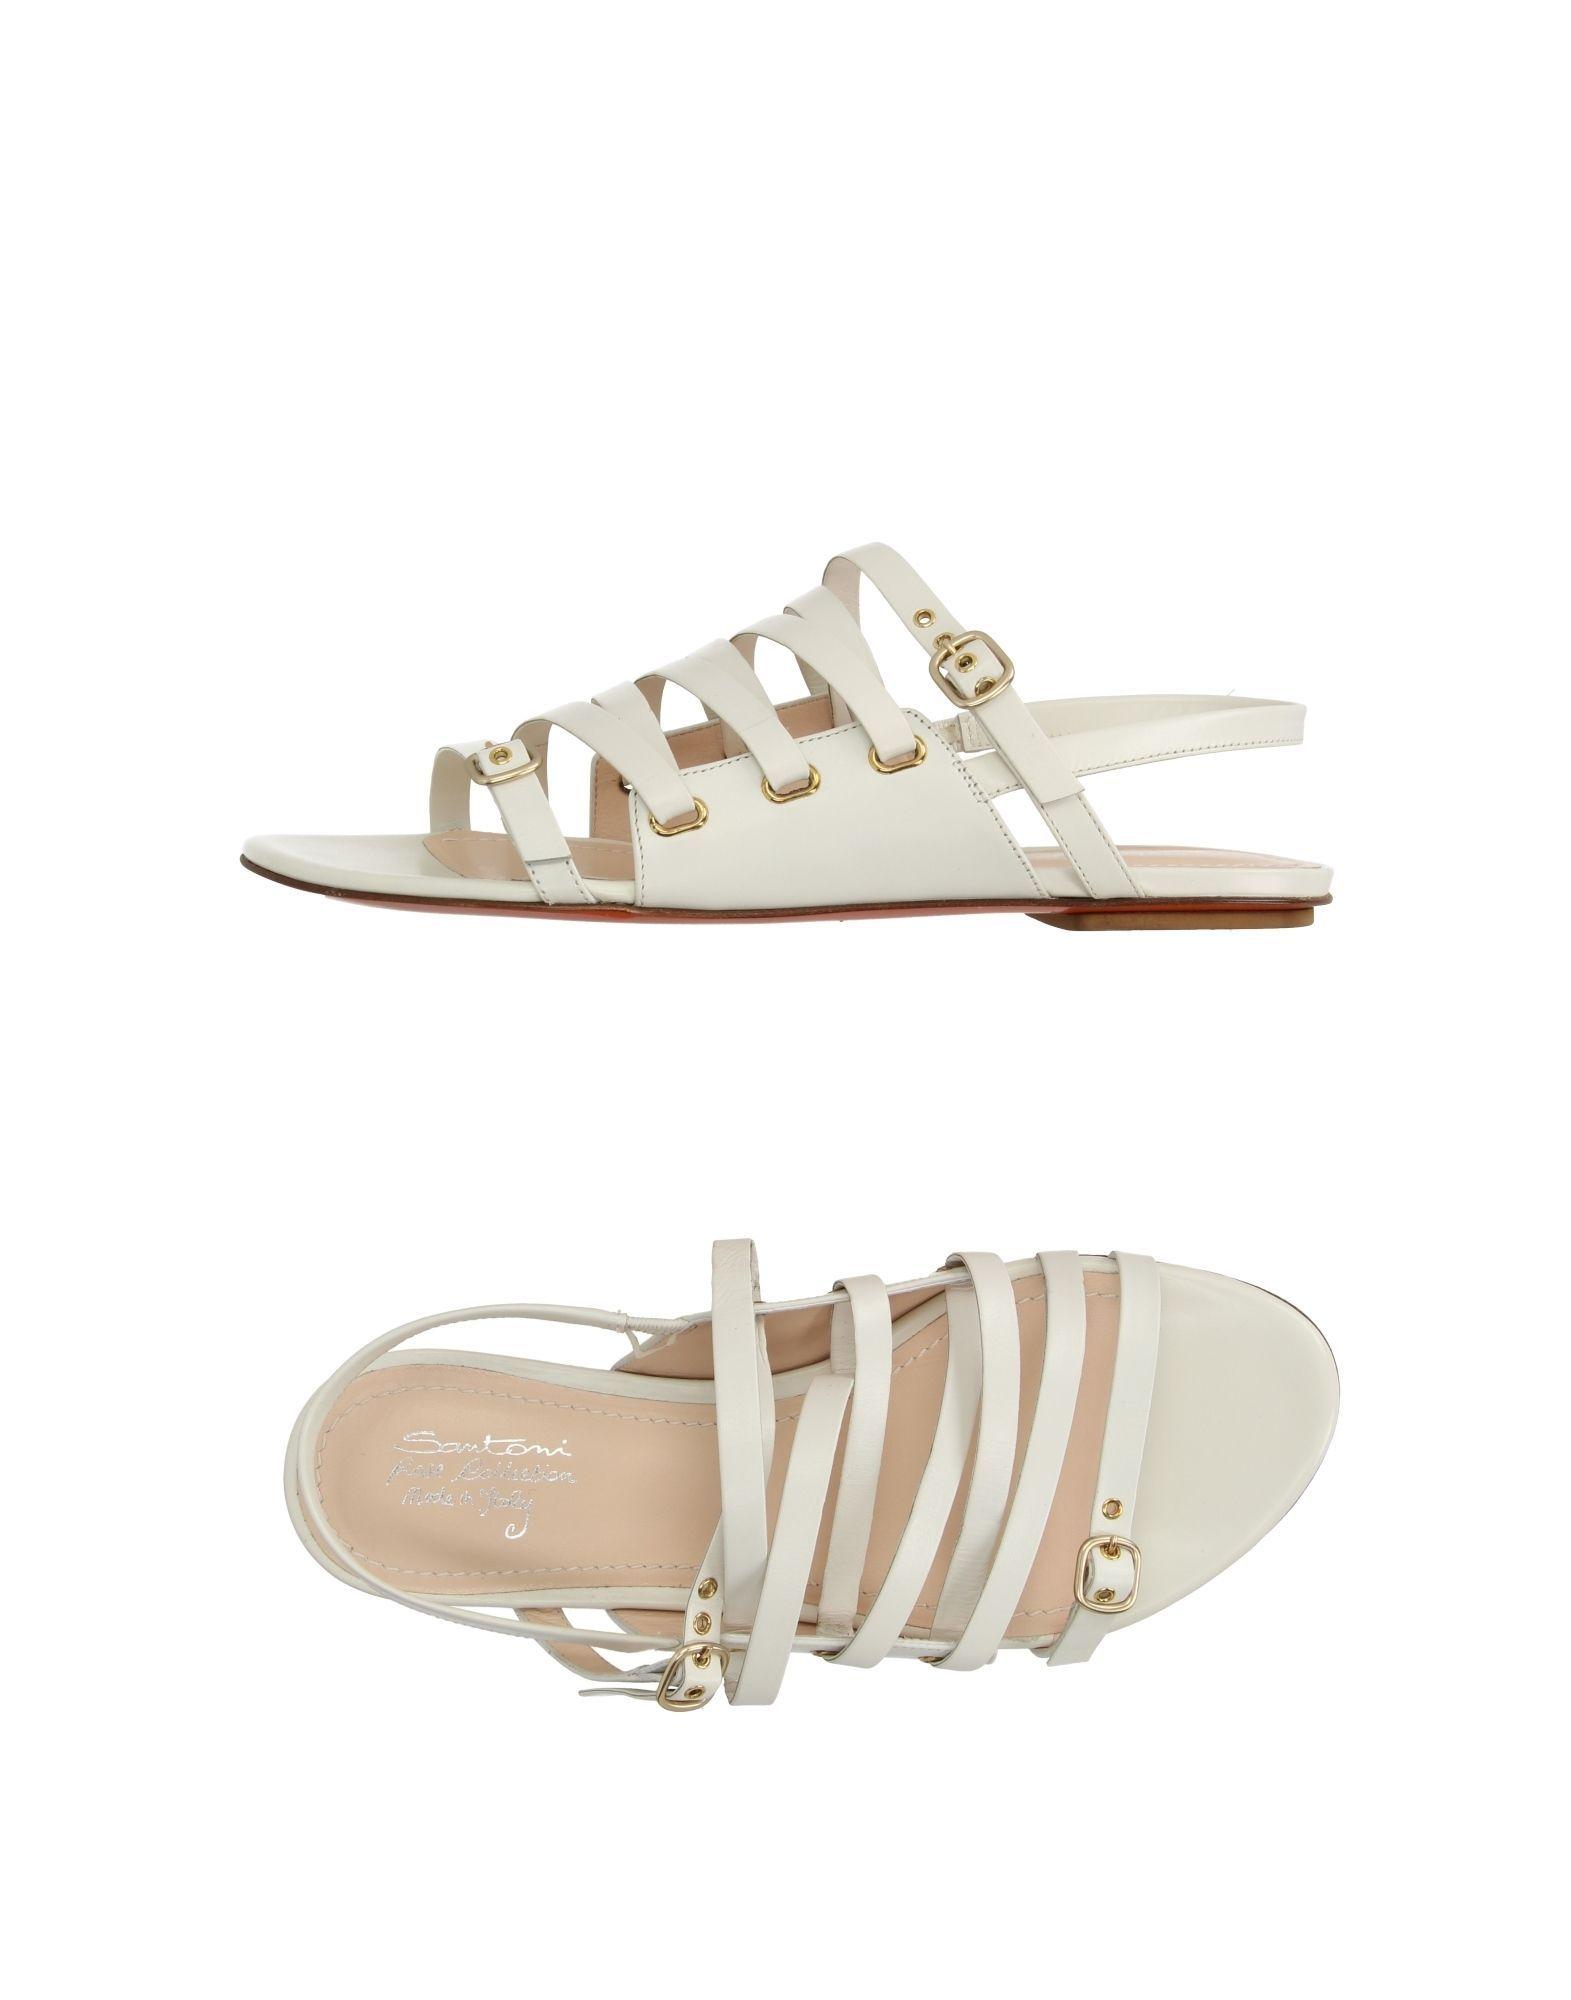 Santoni Women's Sandals White Leather